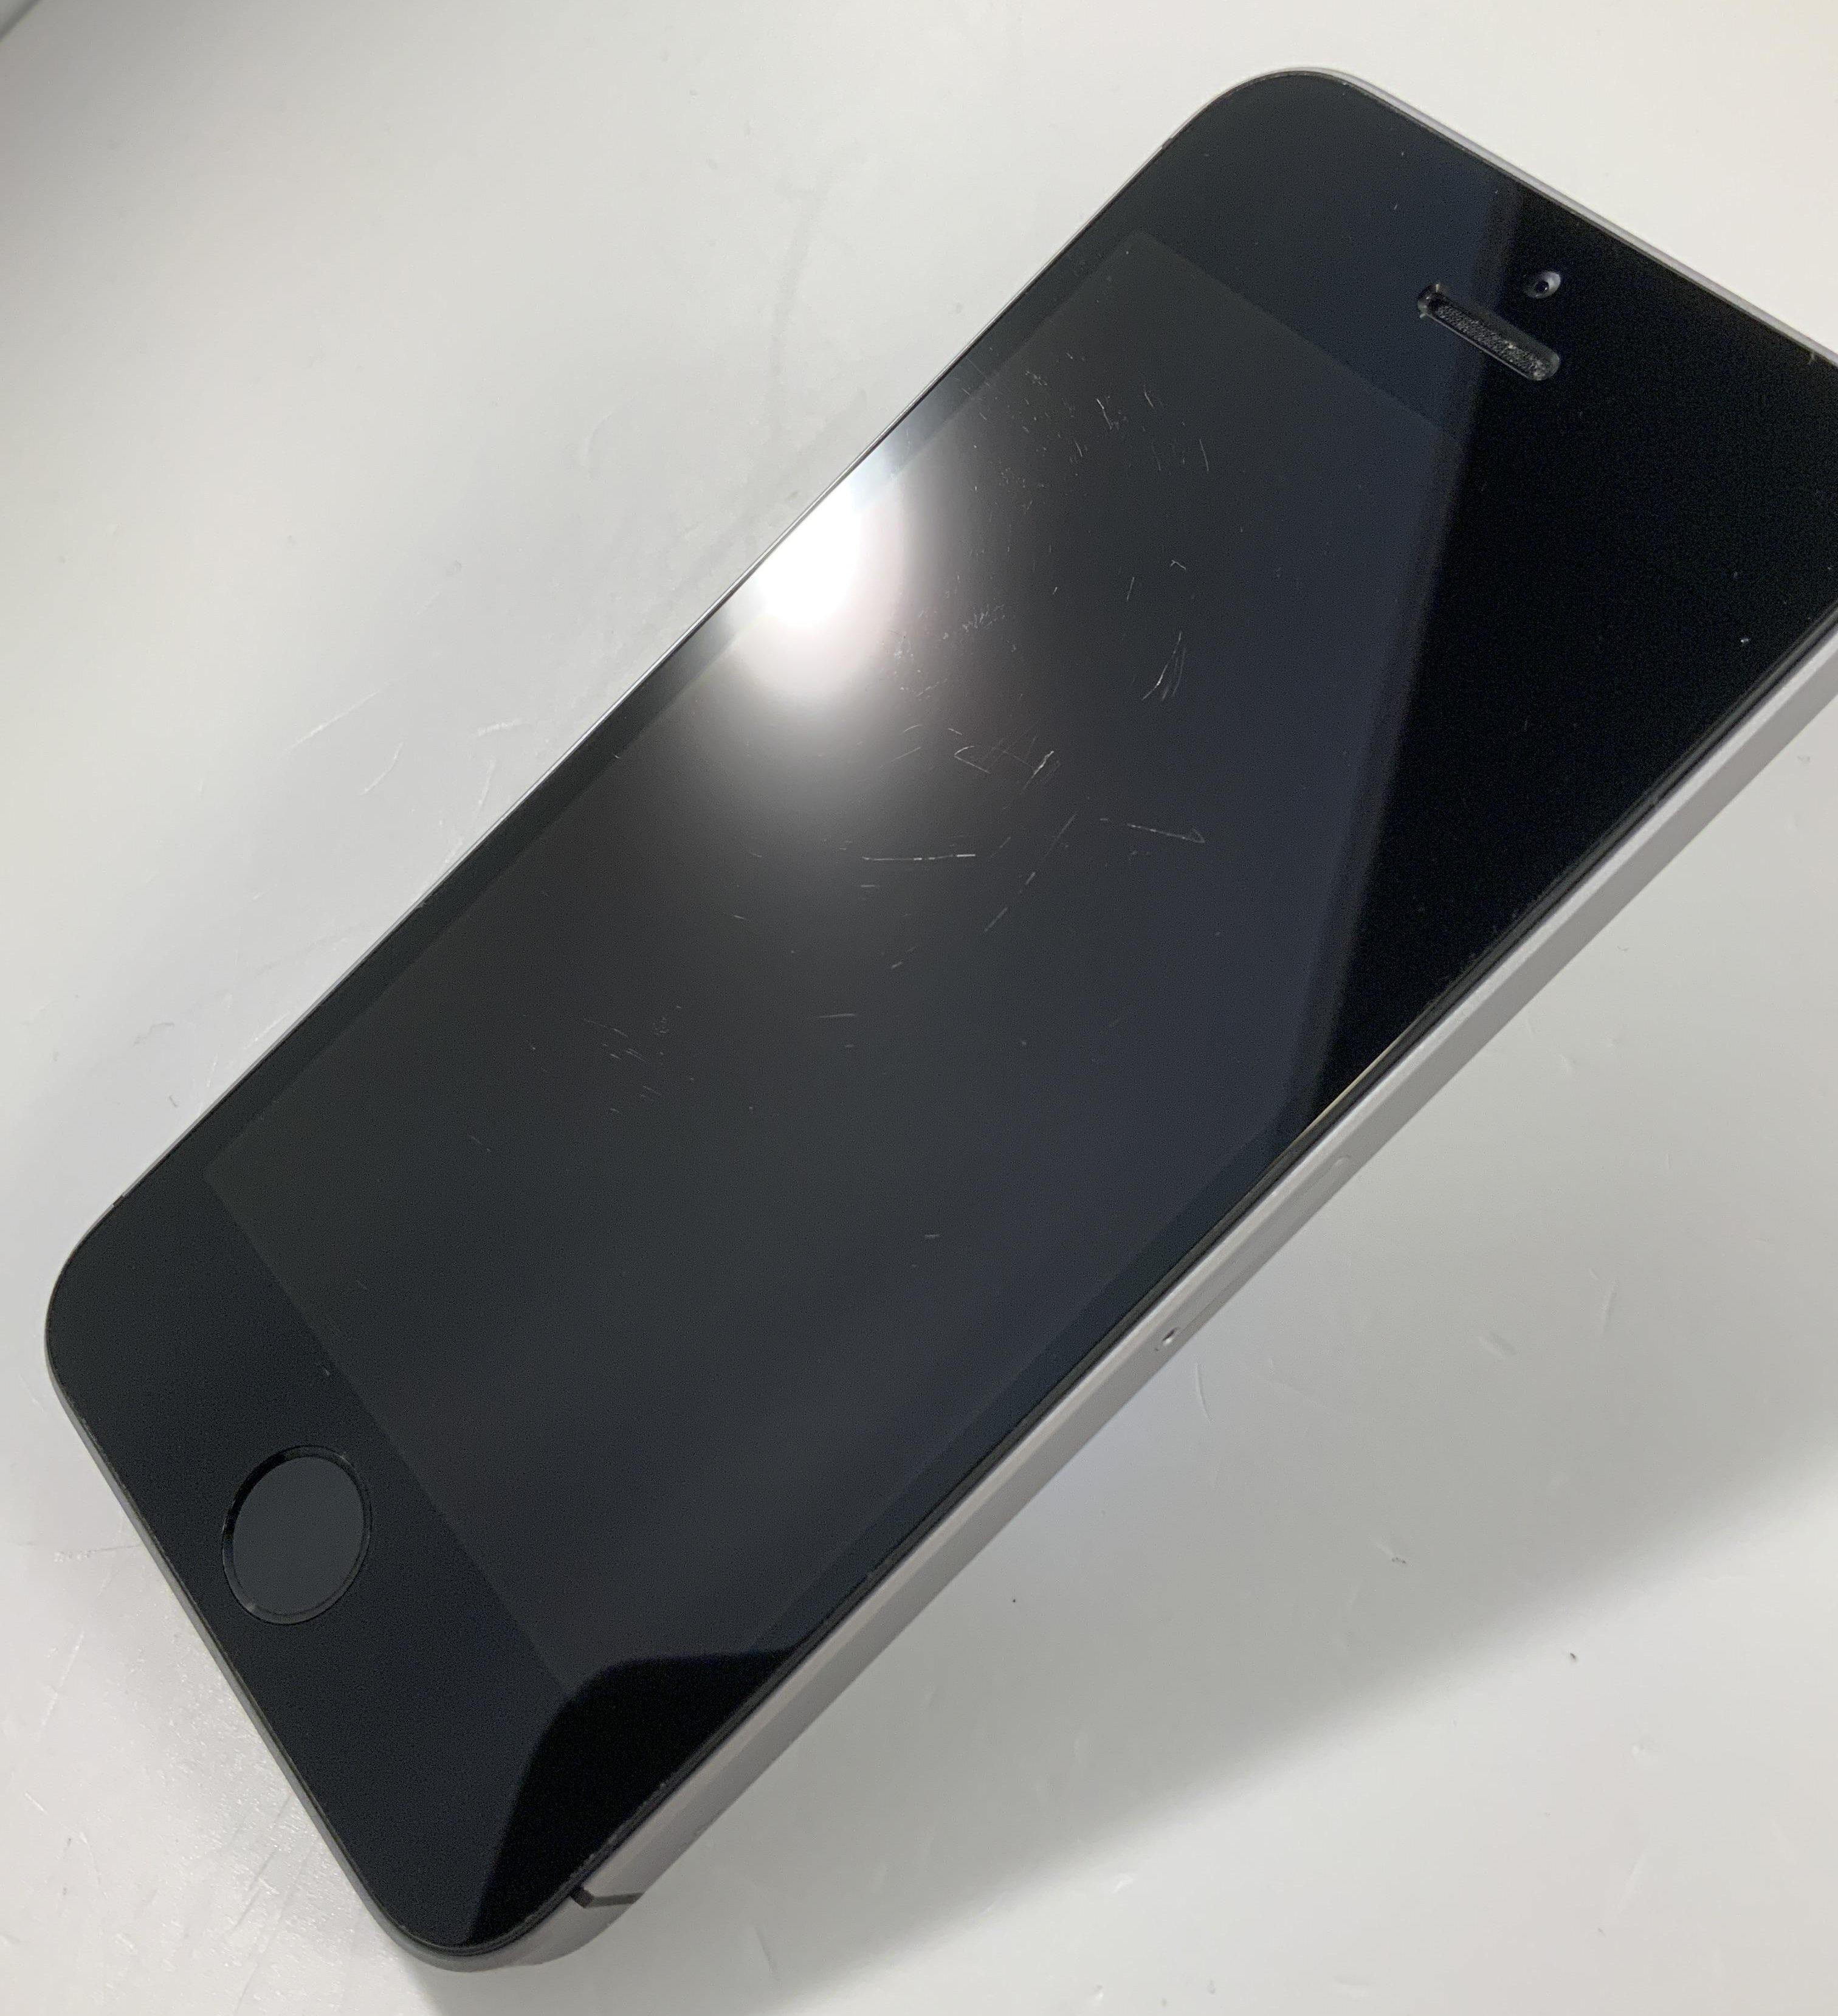 iPhone SE 32GB, 32GB, Space Gray, immagine 3